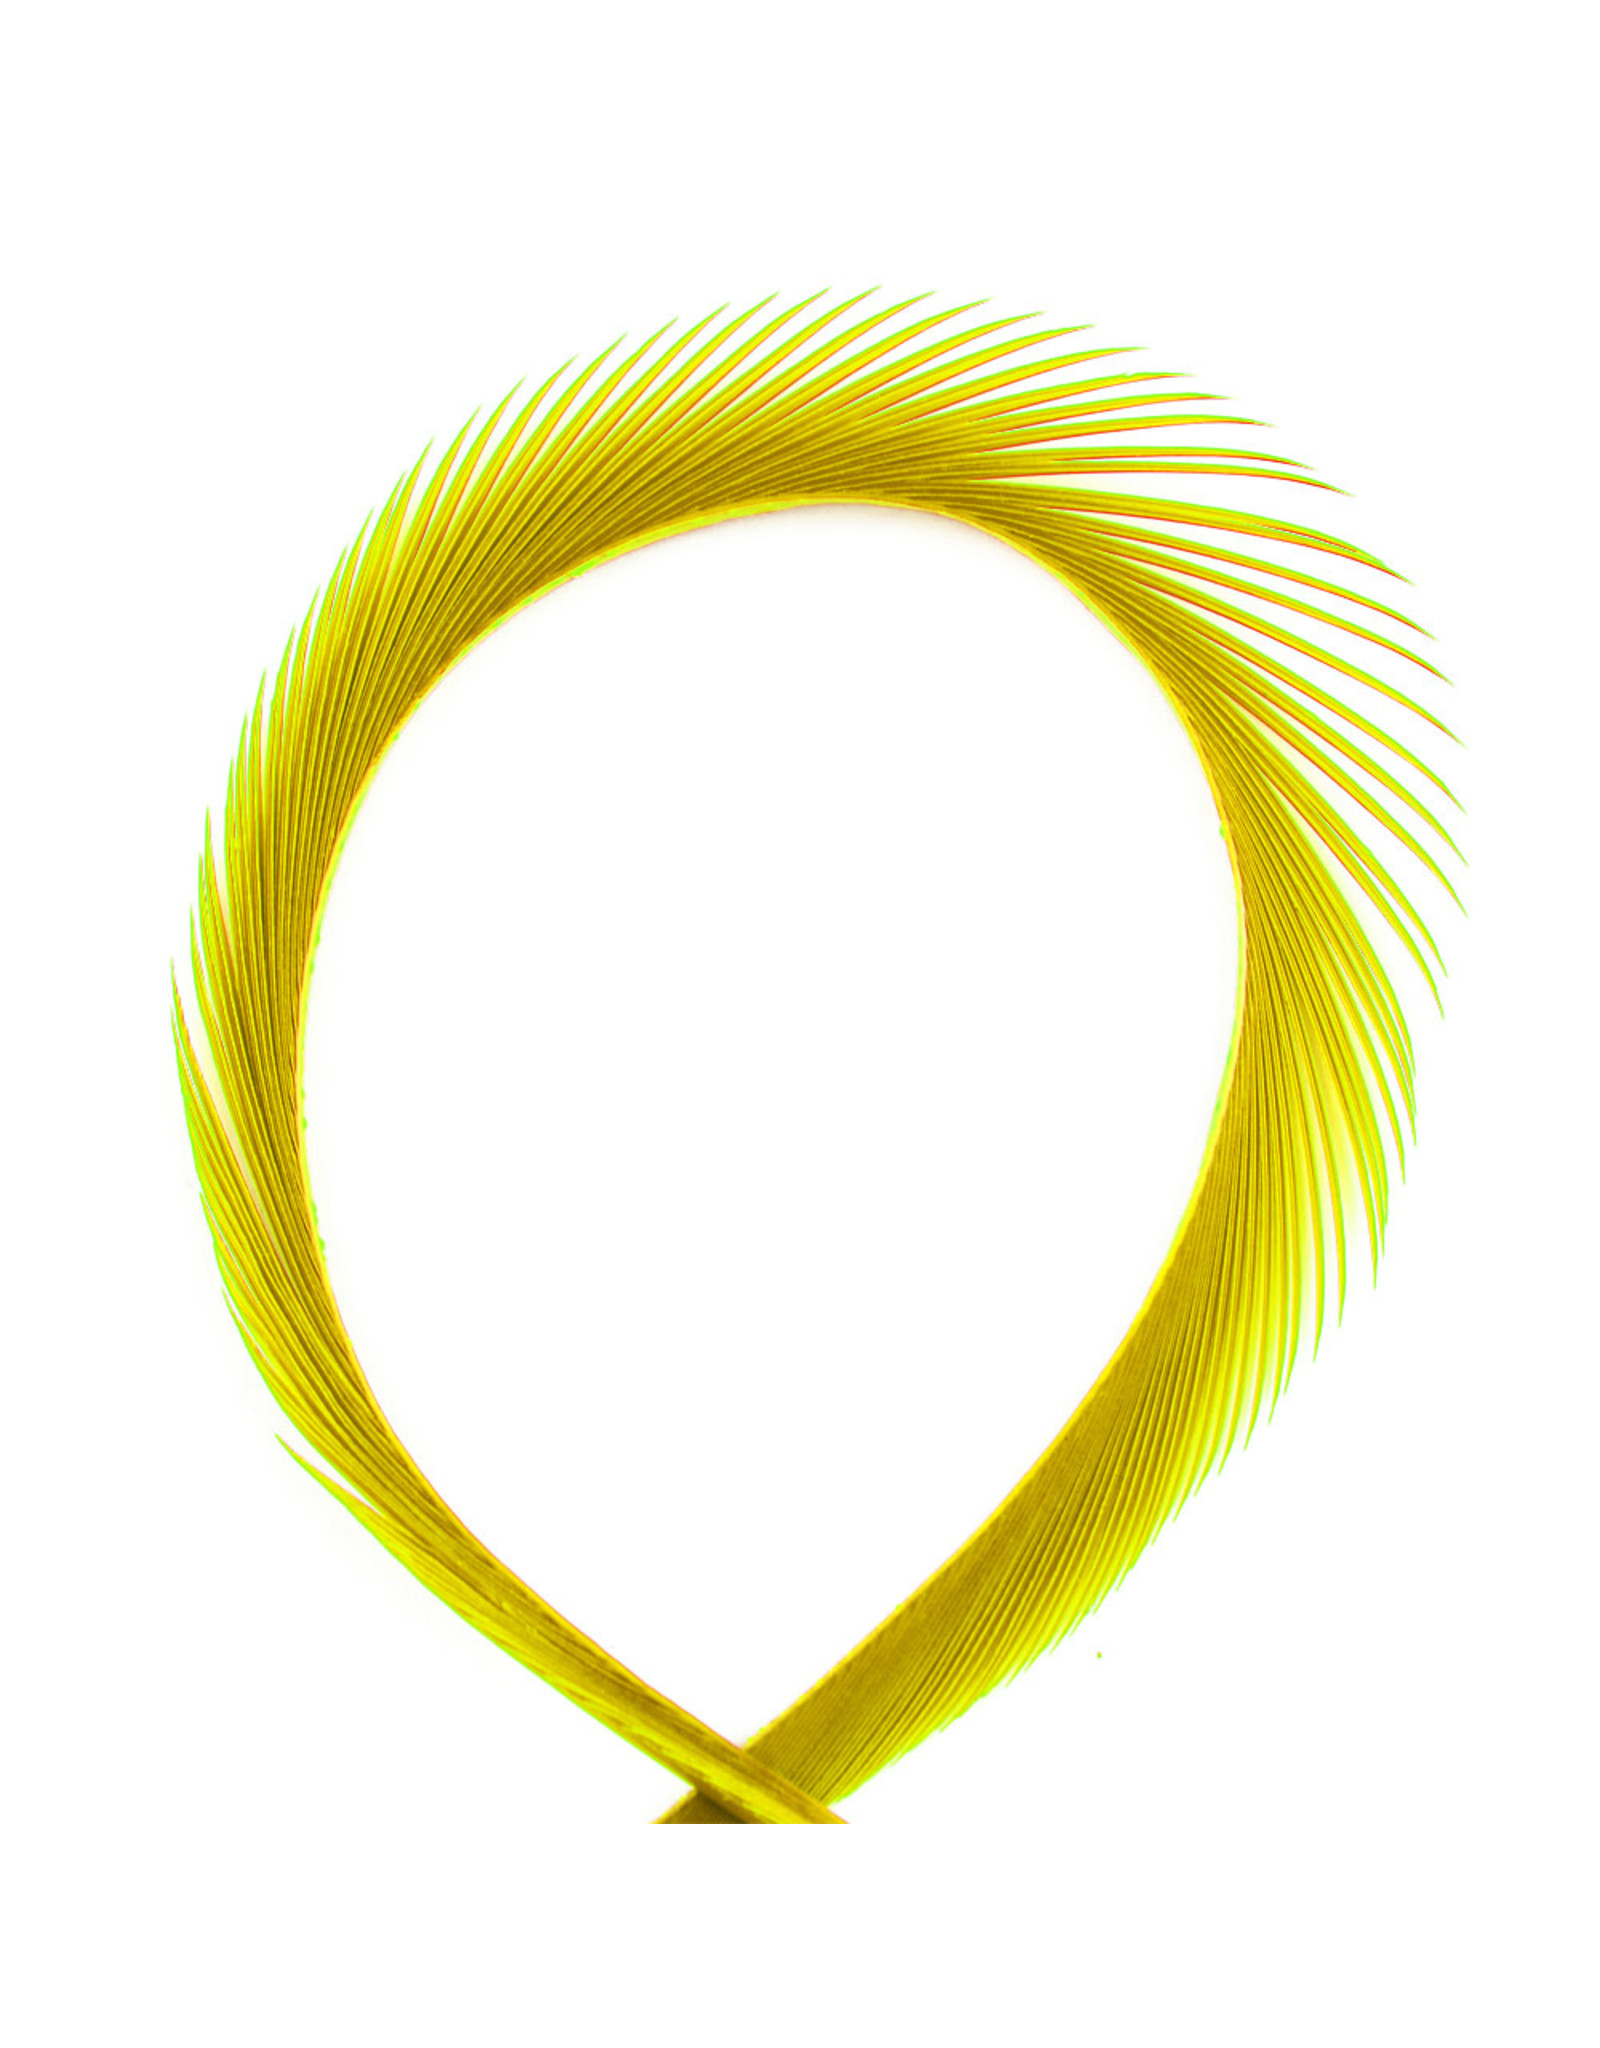 SHOR SHOR Goose Biot Strips - Bright Yellow